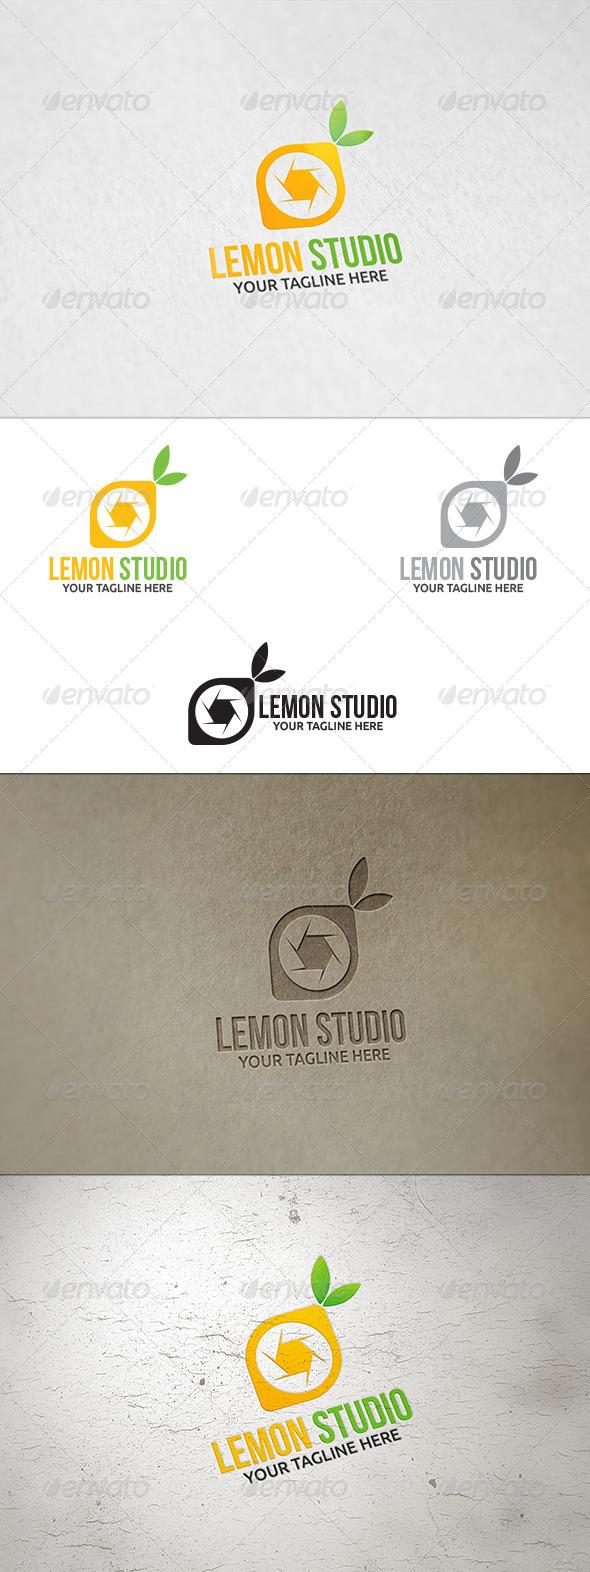 Lemon Studio - Logo Template